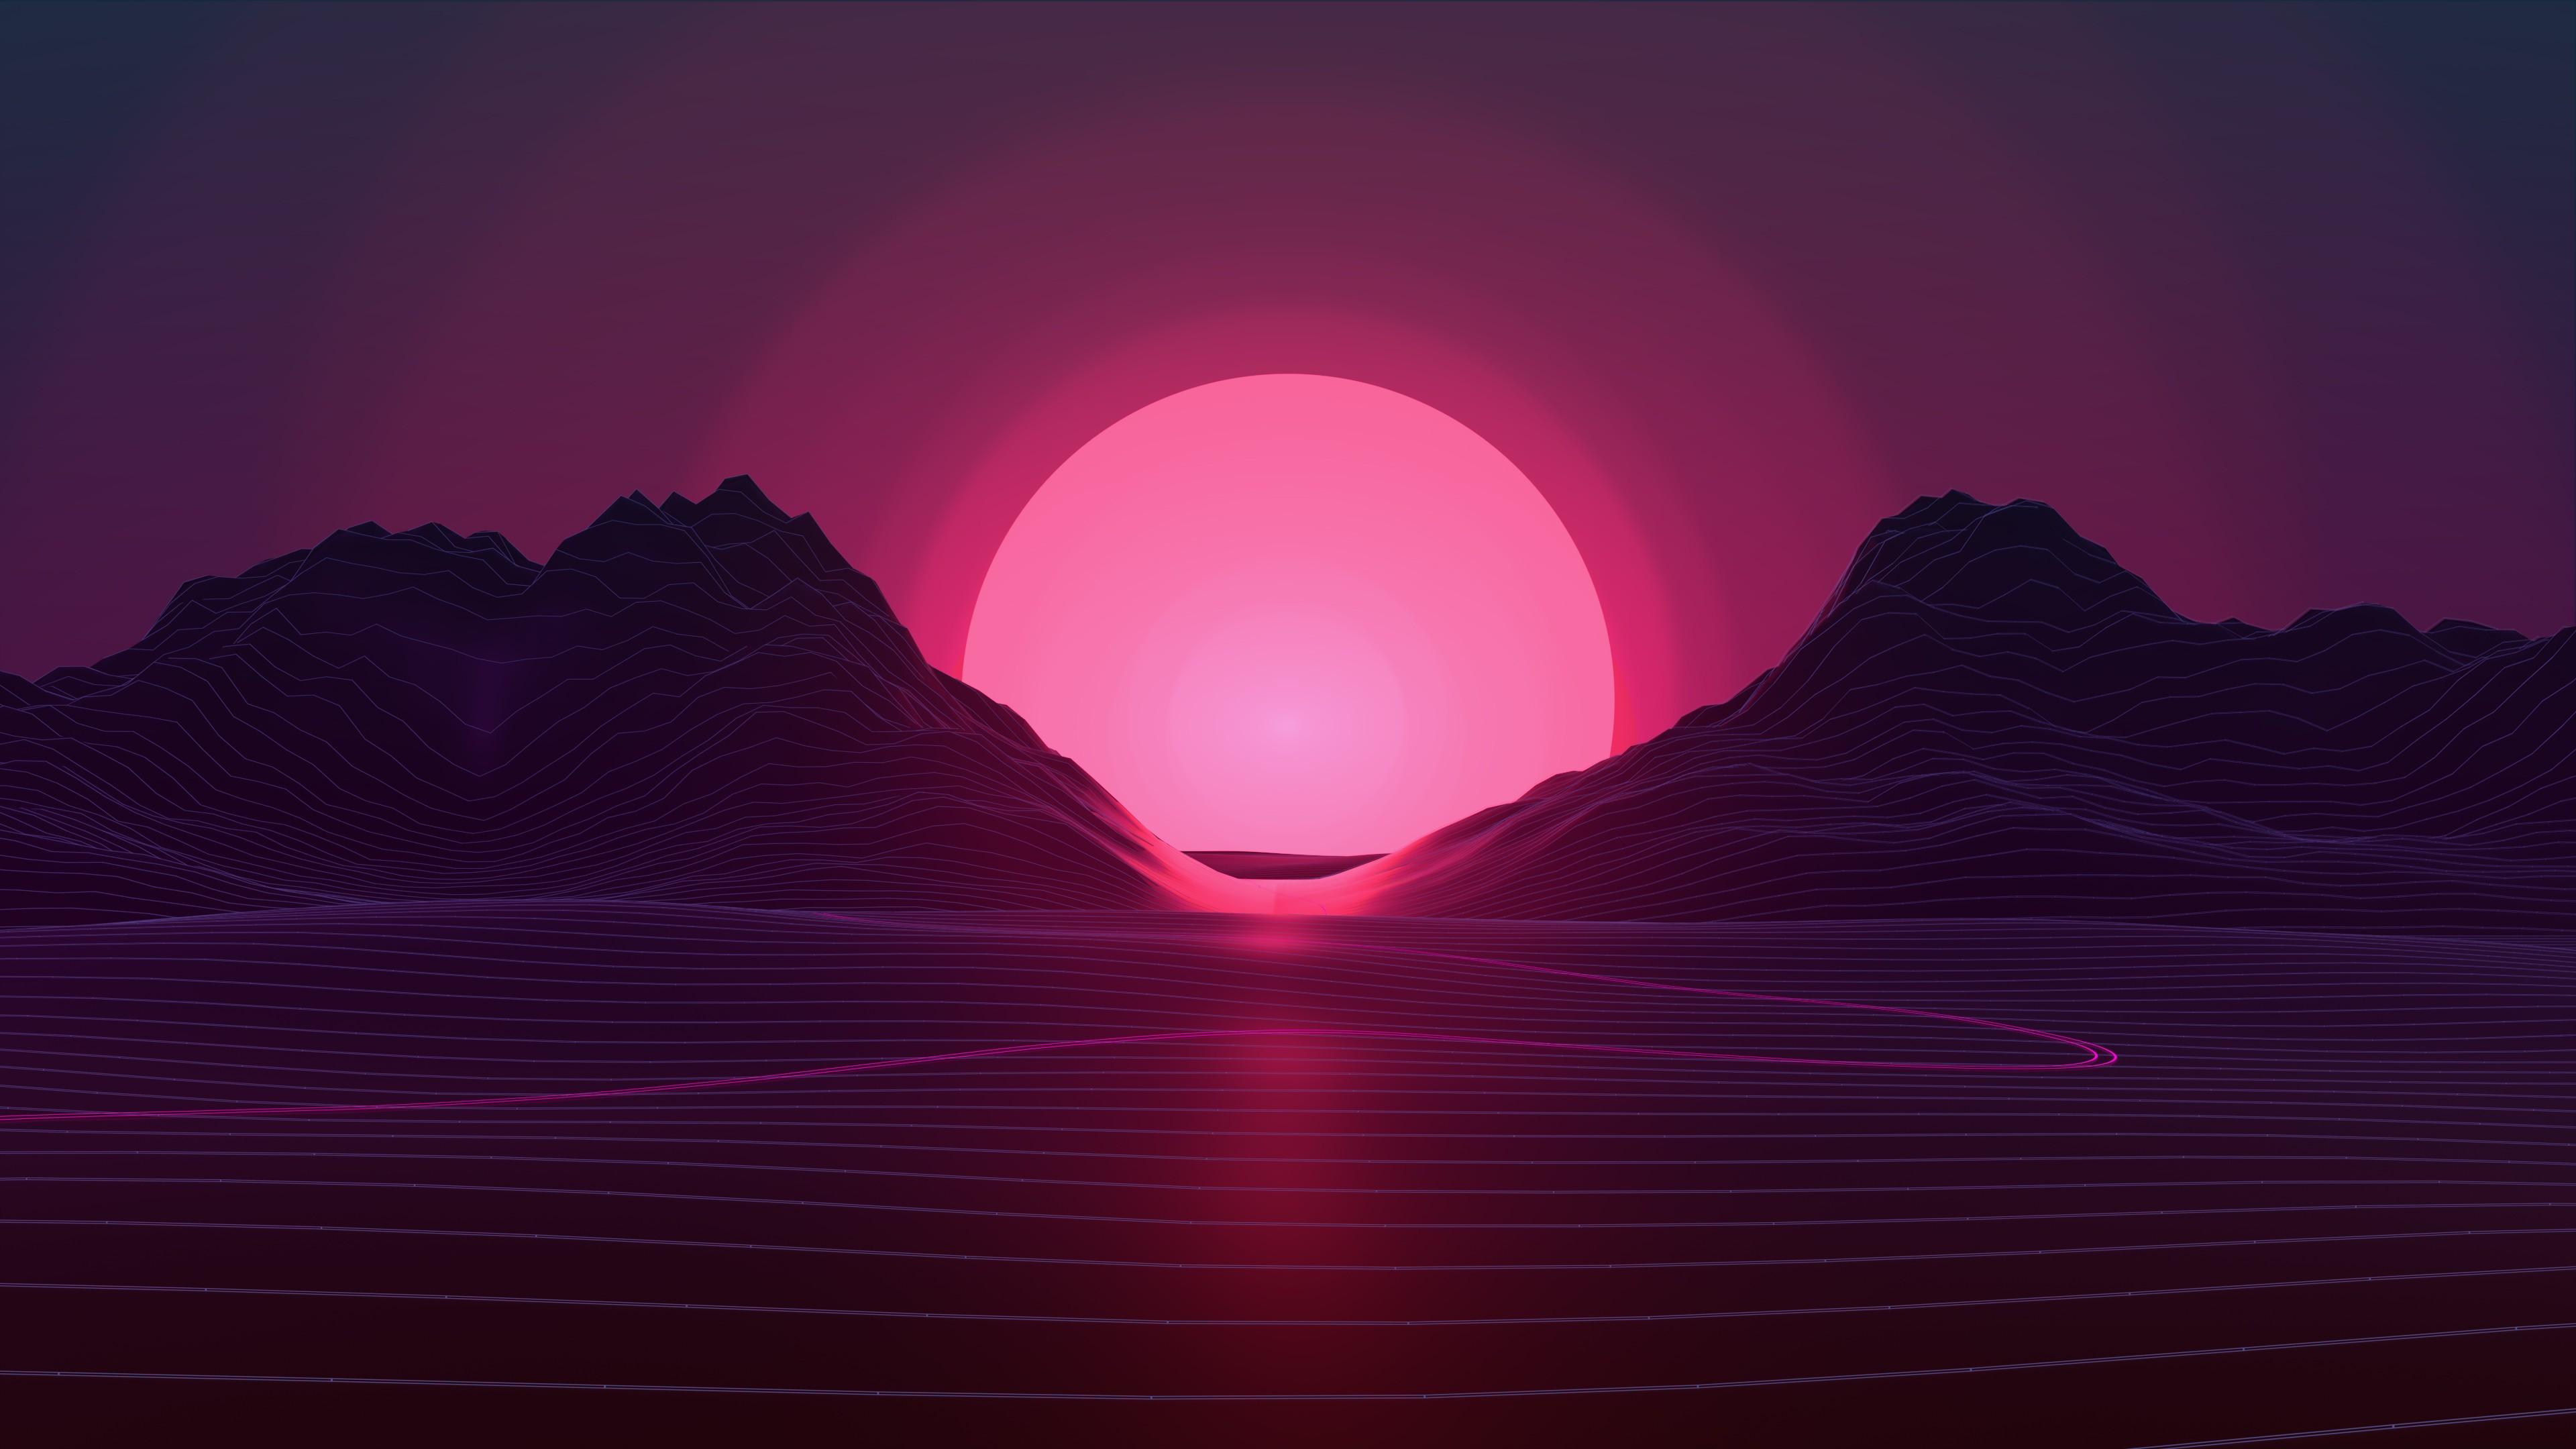 Wallpaper Neon Sunset Retro Style 3840x2160 Youngscum